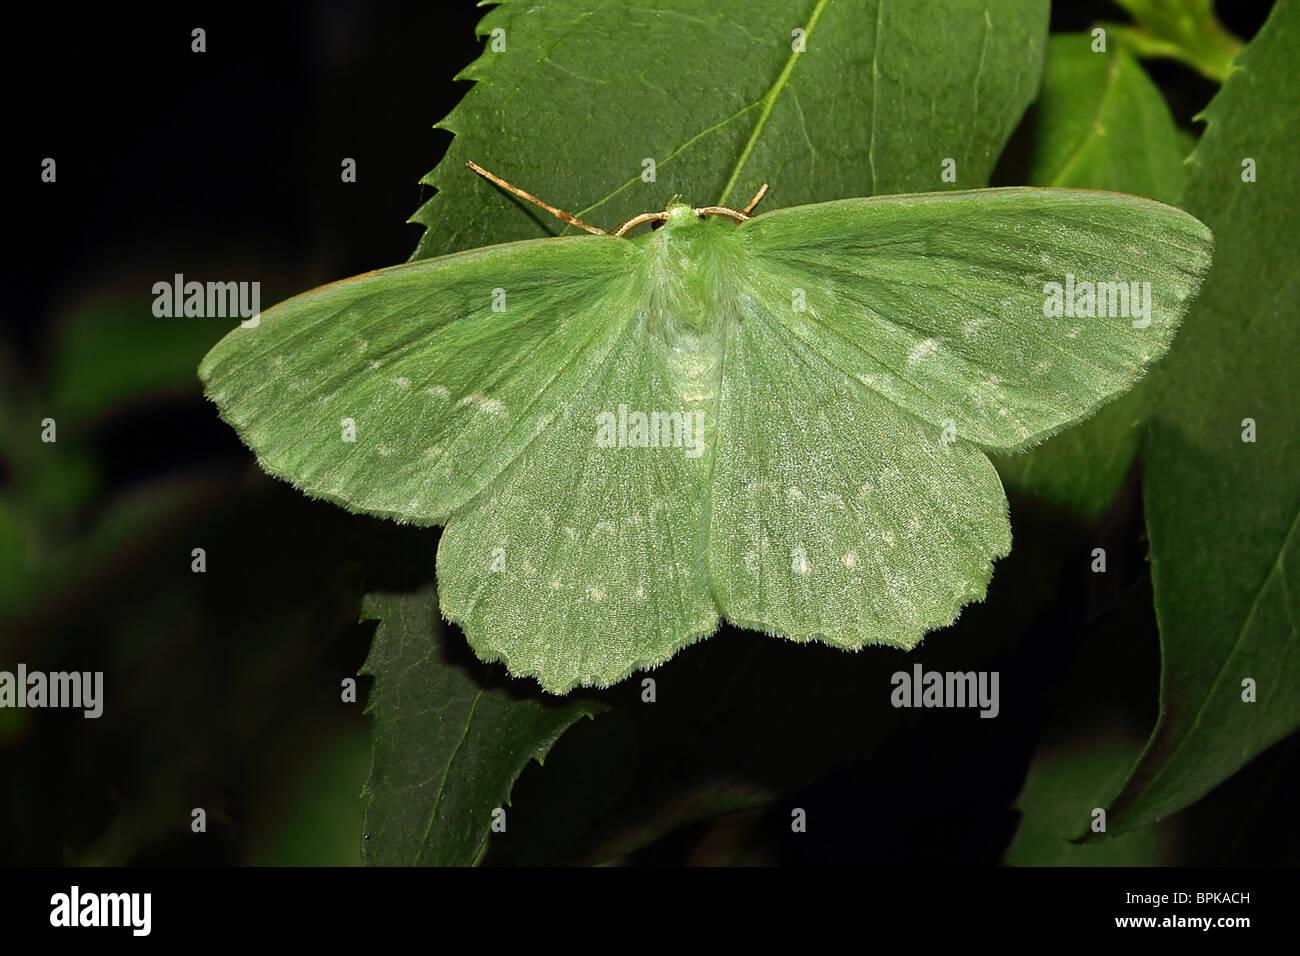 Large Emerald Moth Geometra papilionaria - Stock Image